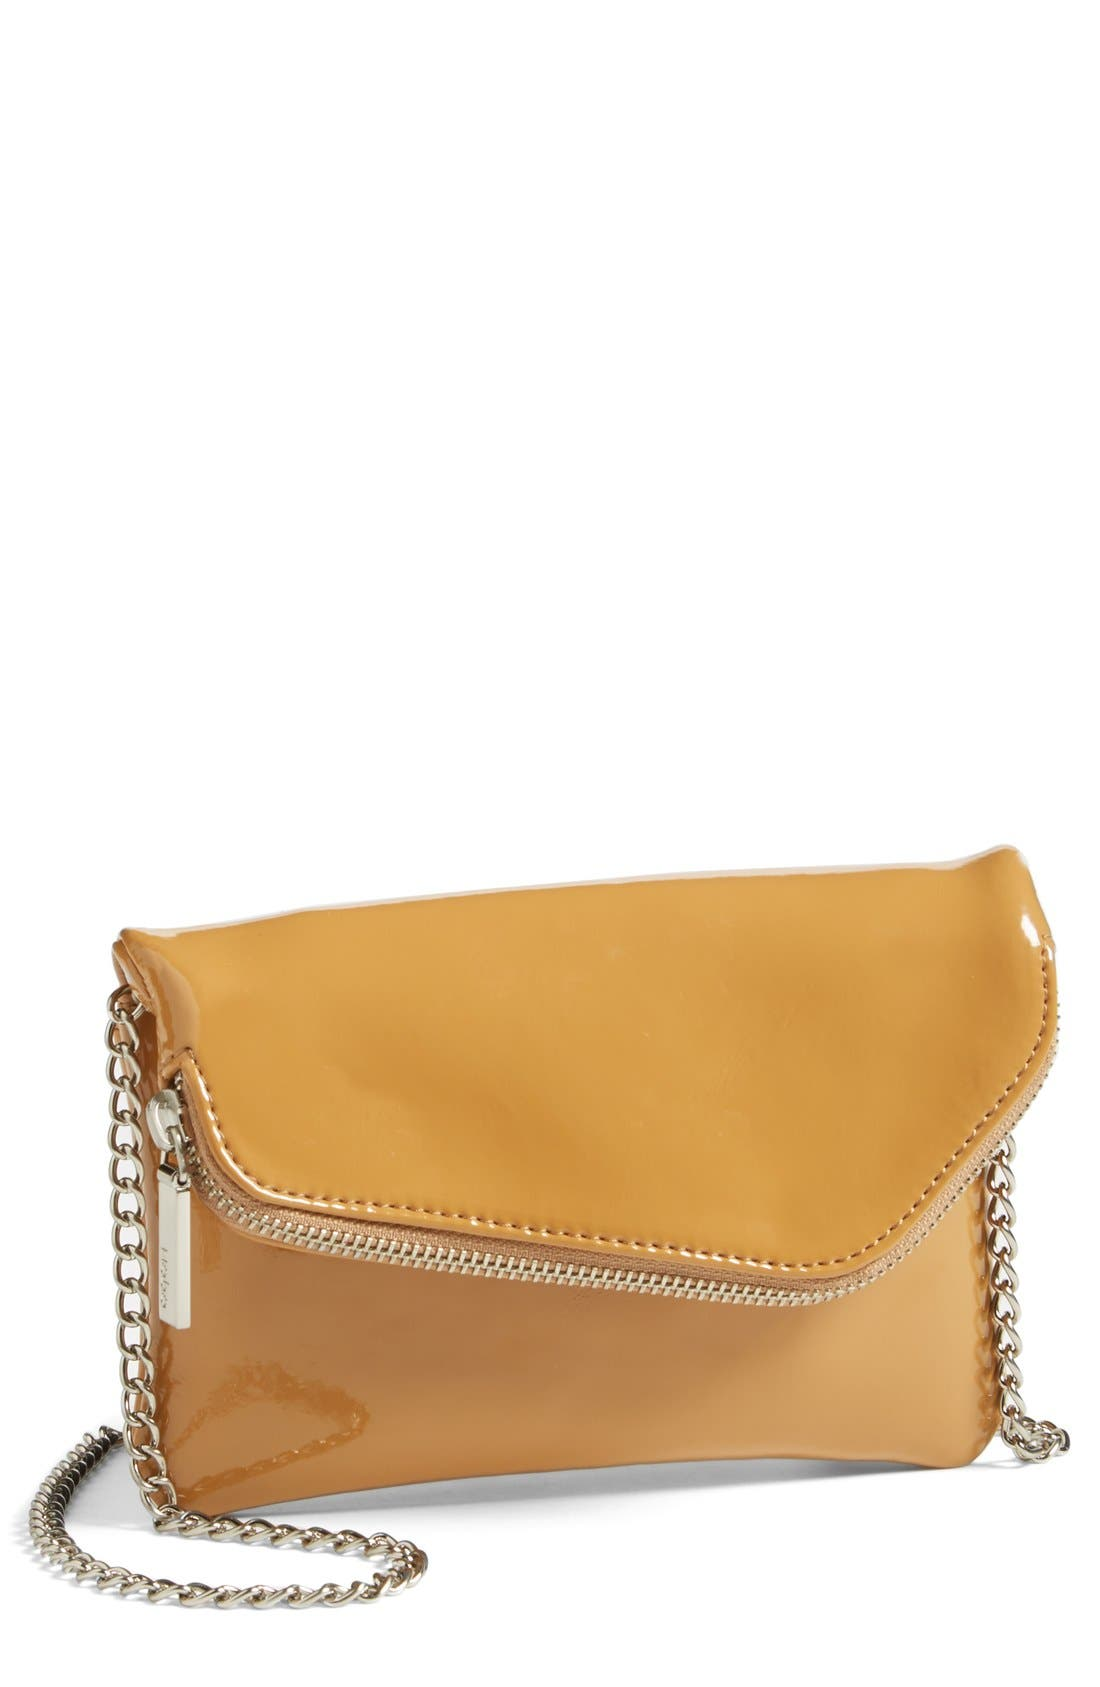 Alternate Image 1 Selected - Hobo 'Daria' Patent Leather Crossbody